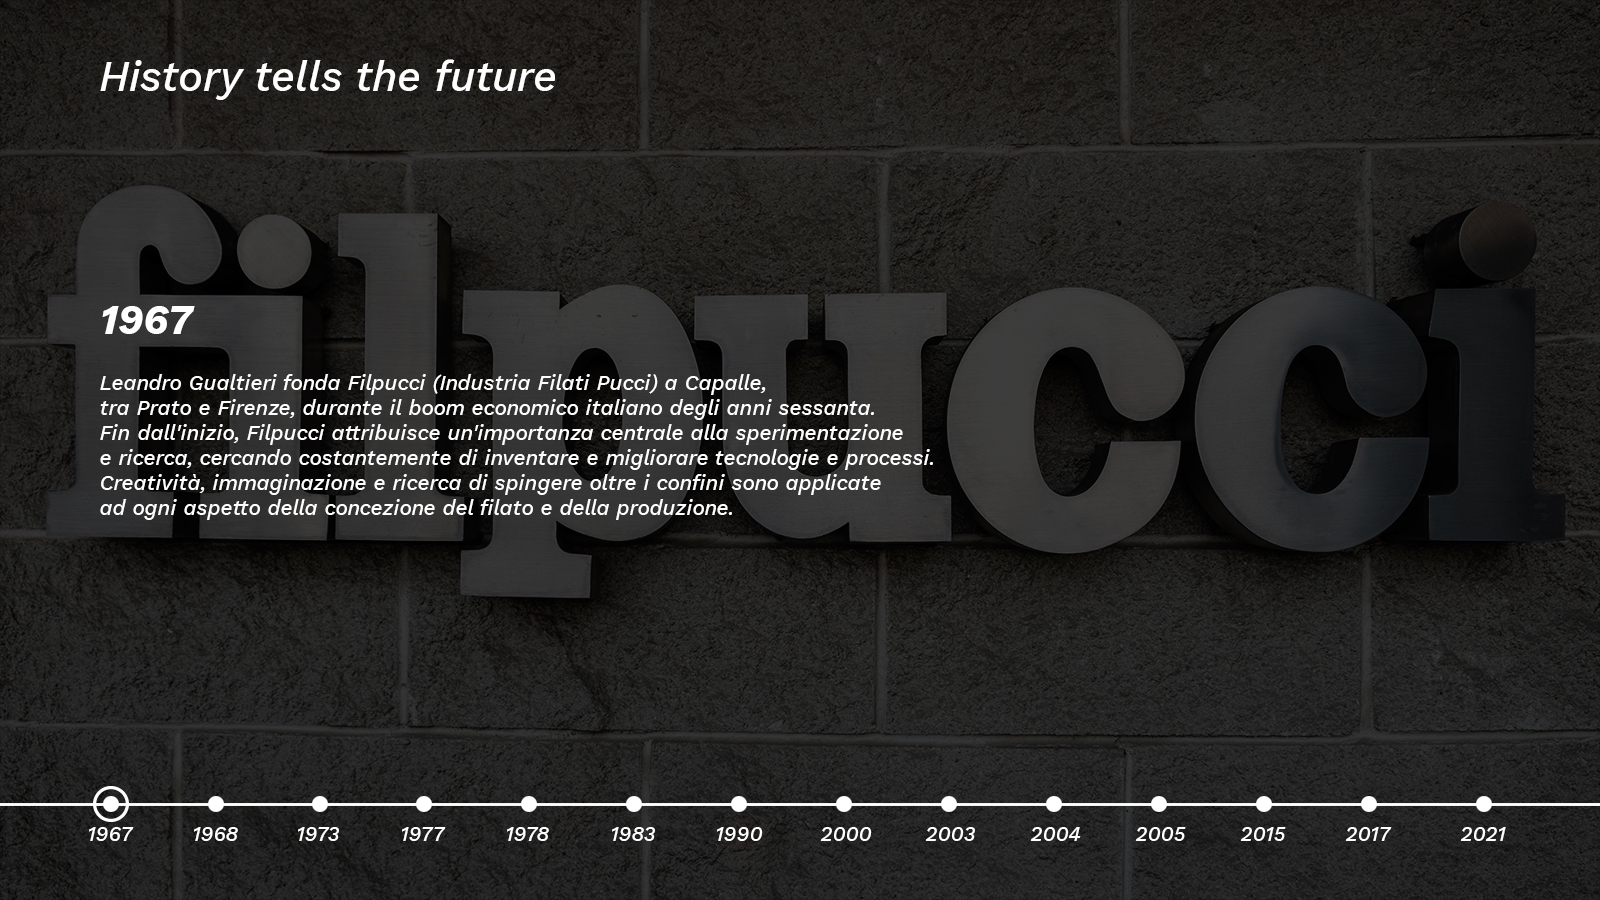 1967 Filpucci Hystory 1600x900